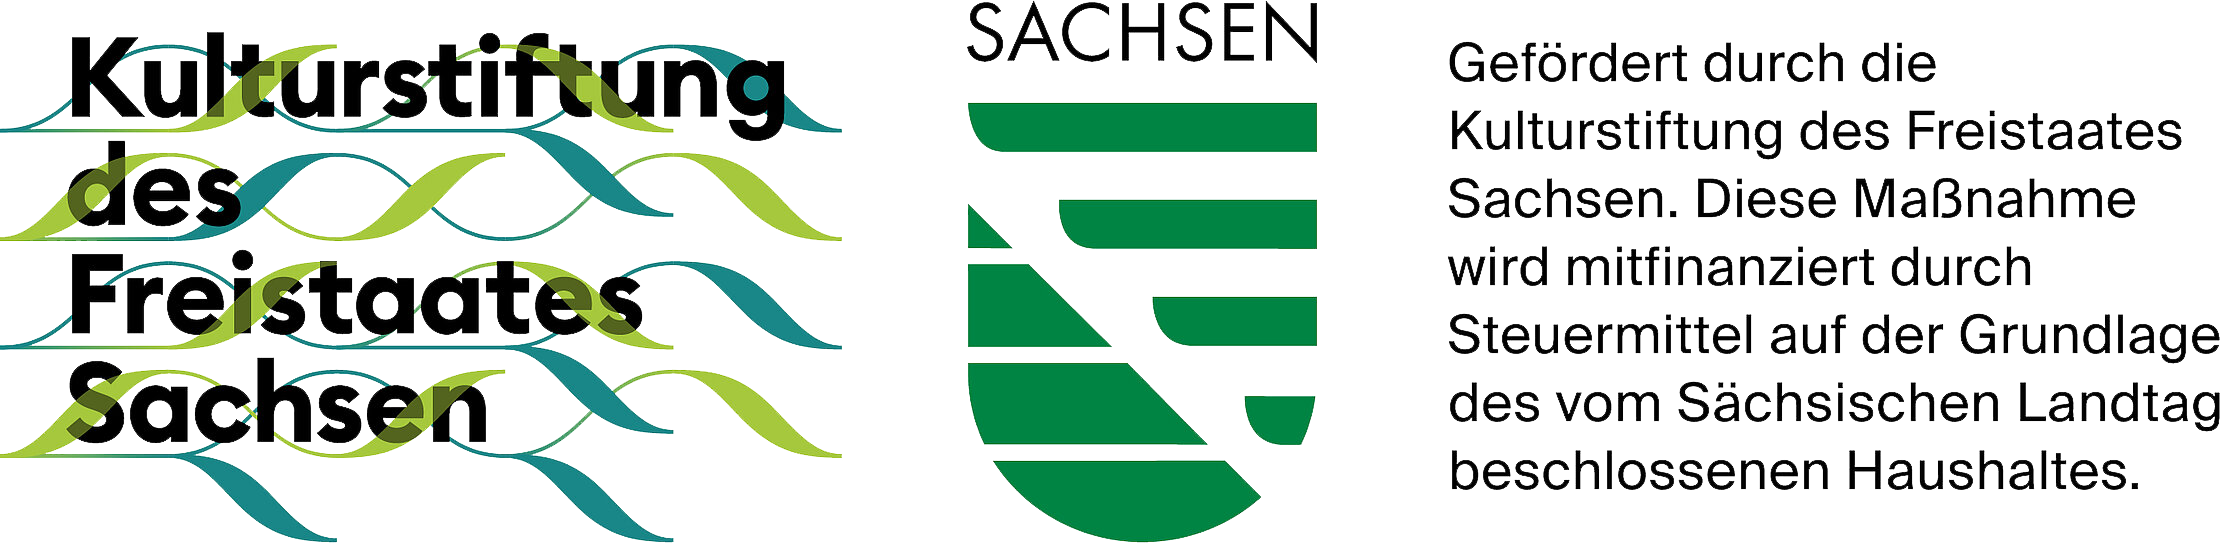 csm_KDFS_Logo_Wappen_Text_2020_transparent_RGB_e86a3fc4e2